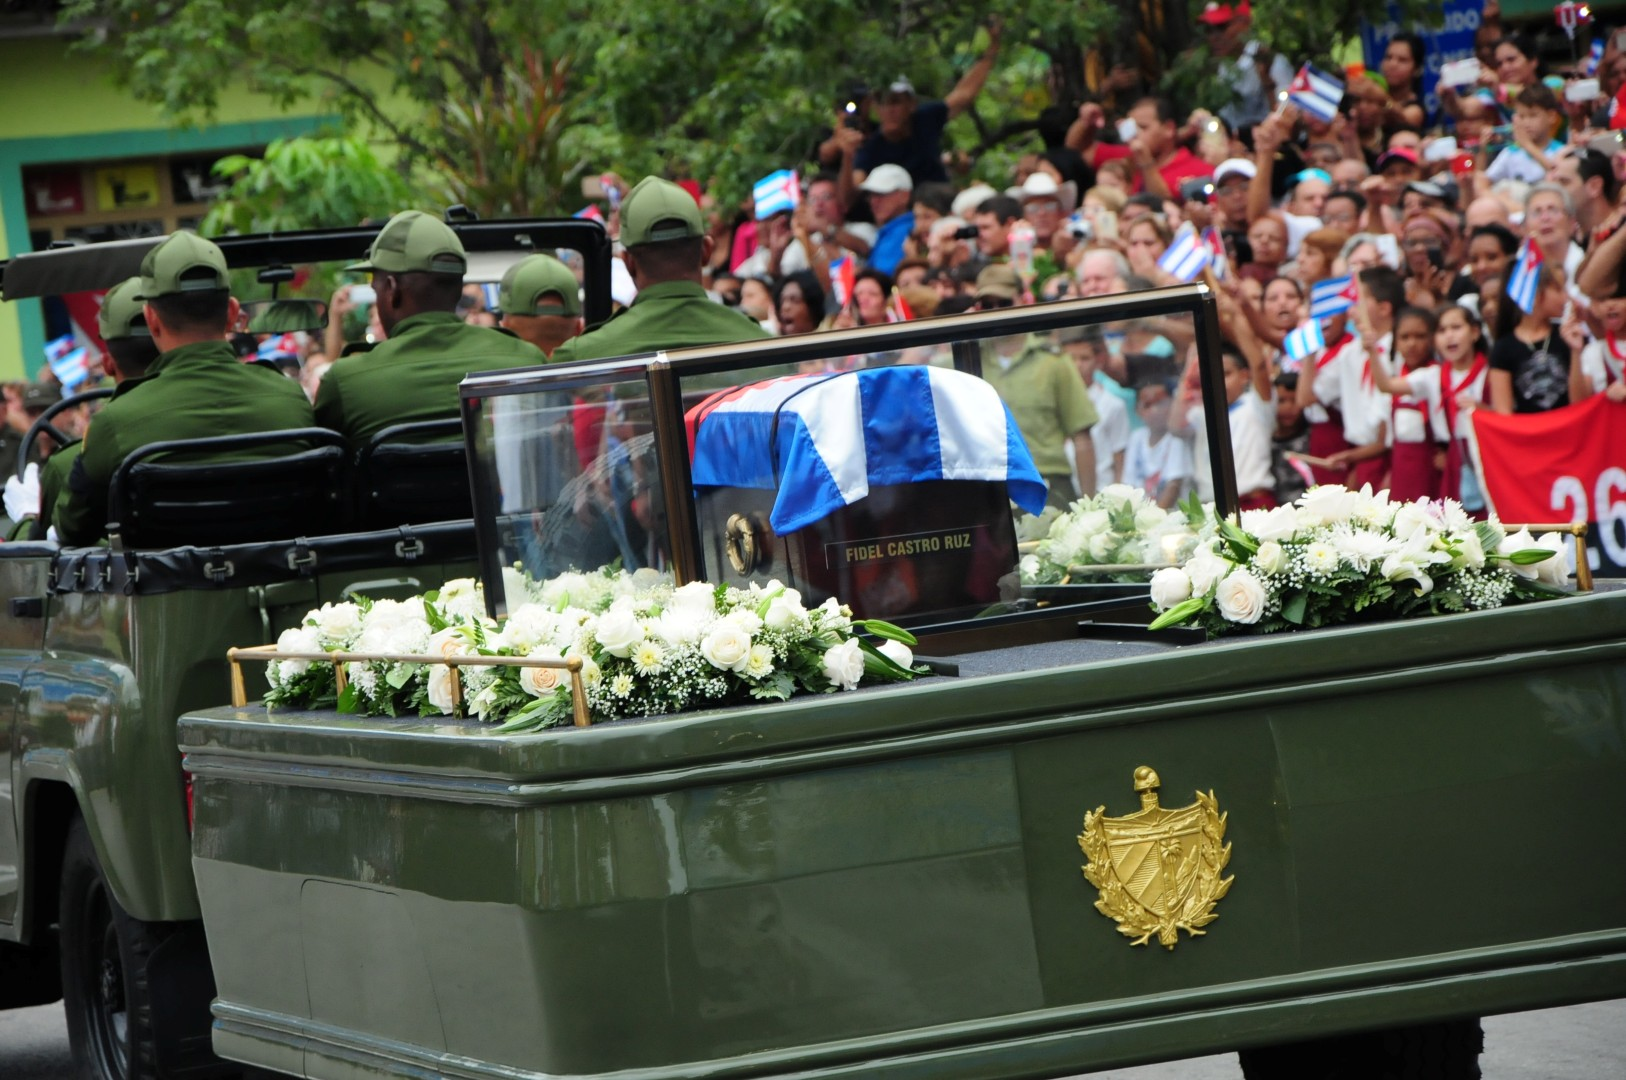 Fidel Castro, Fidel por siempre, Sancti Spíritus, caravana, Cuba